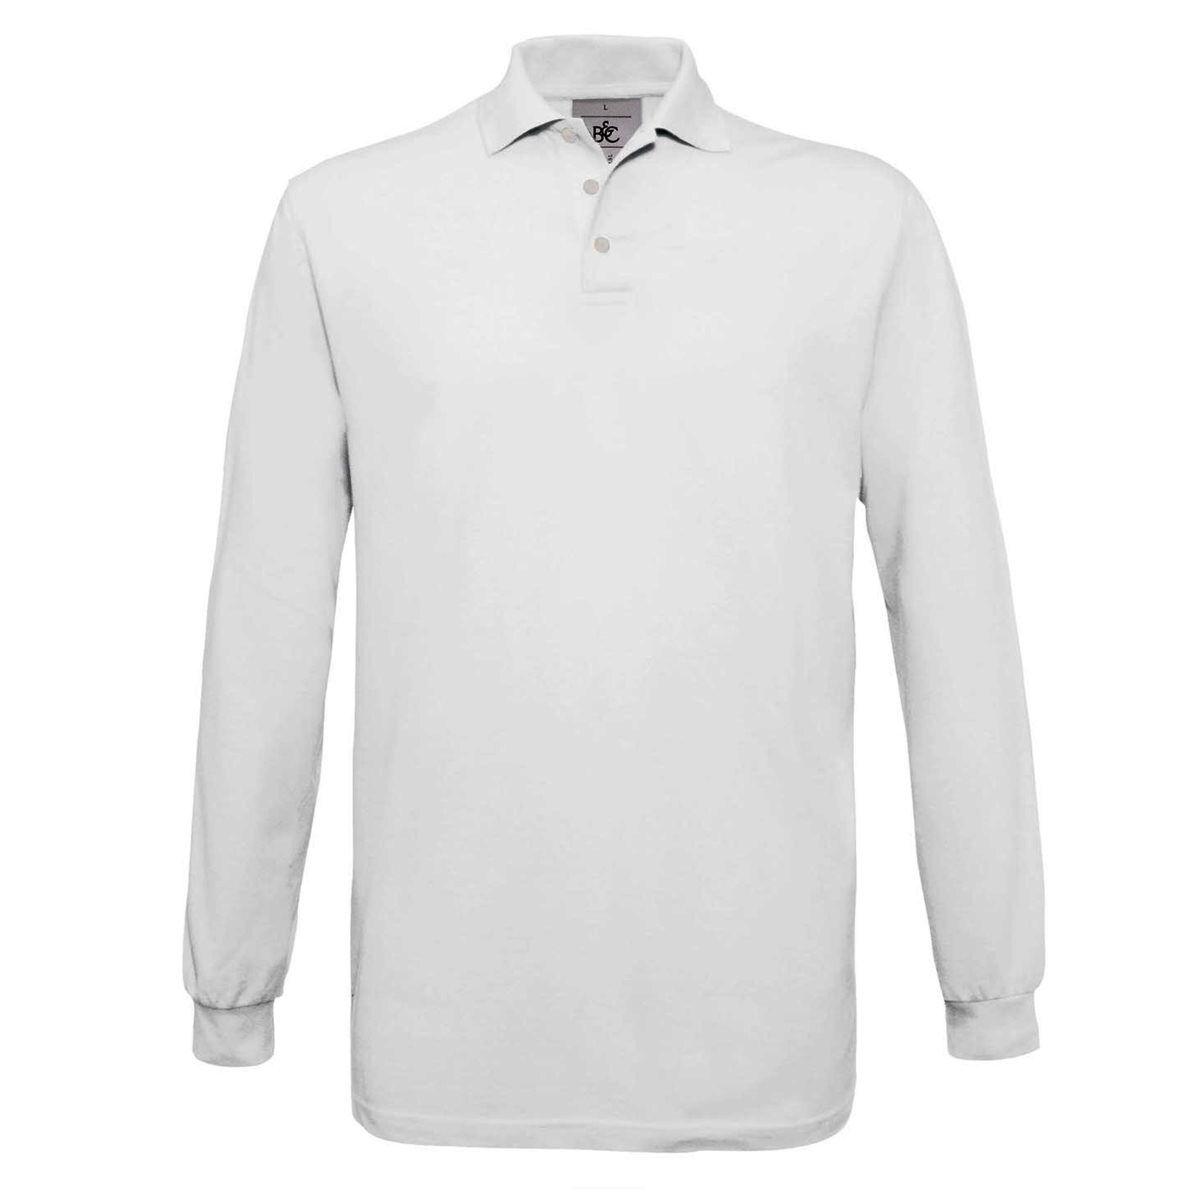 B&C Safran Long Sleeve Piqué Polo Shirts